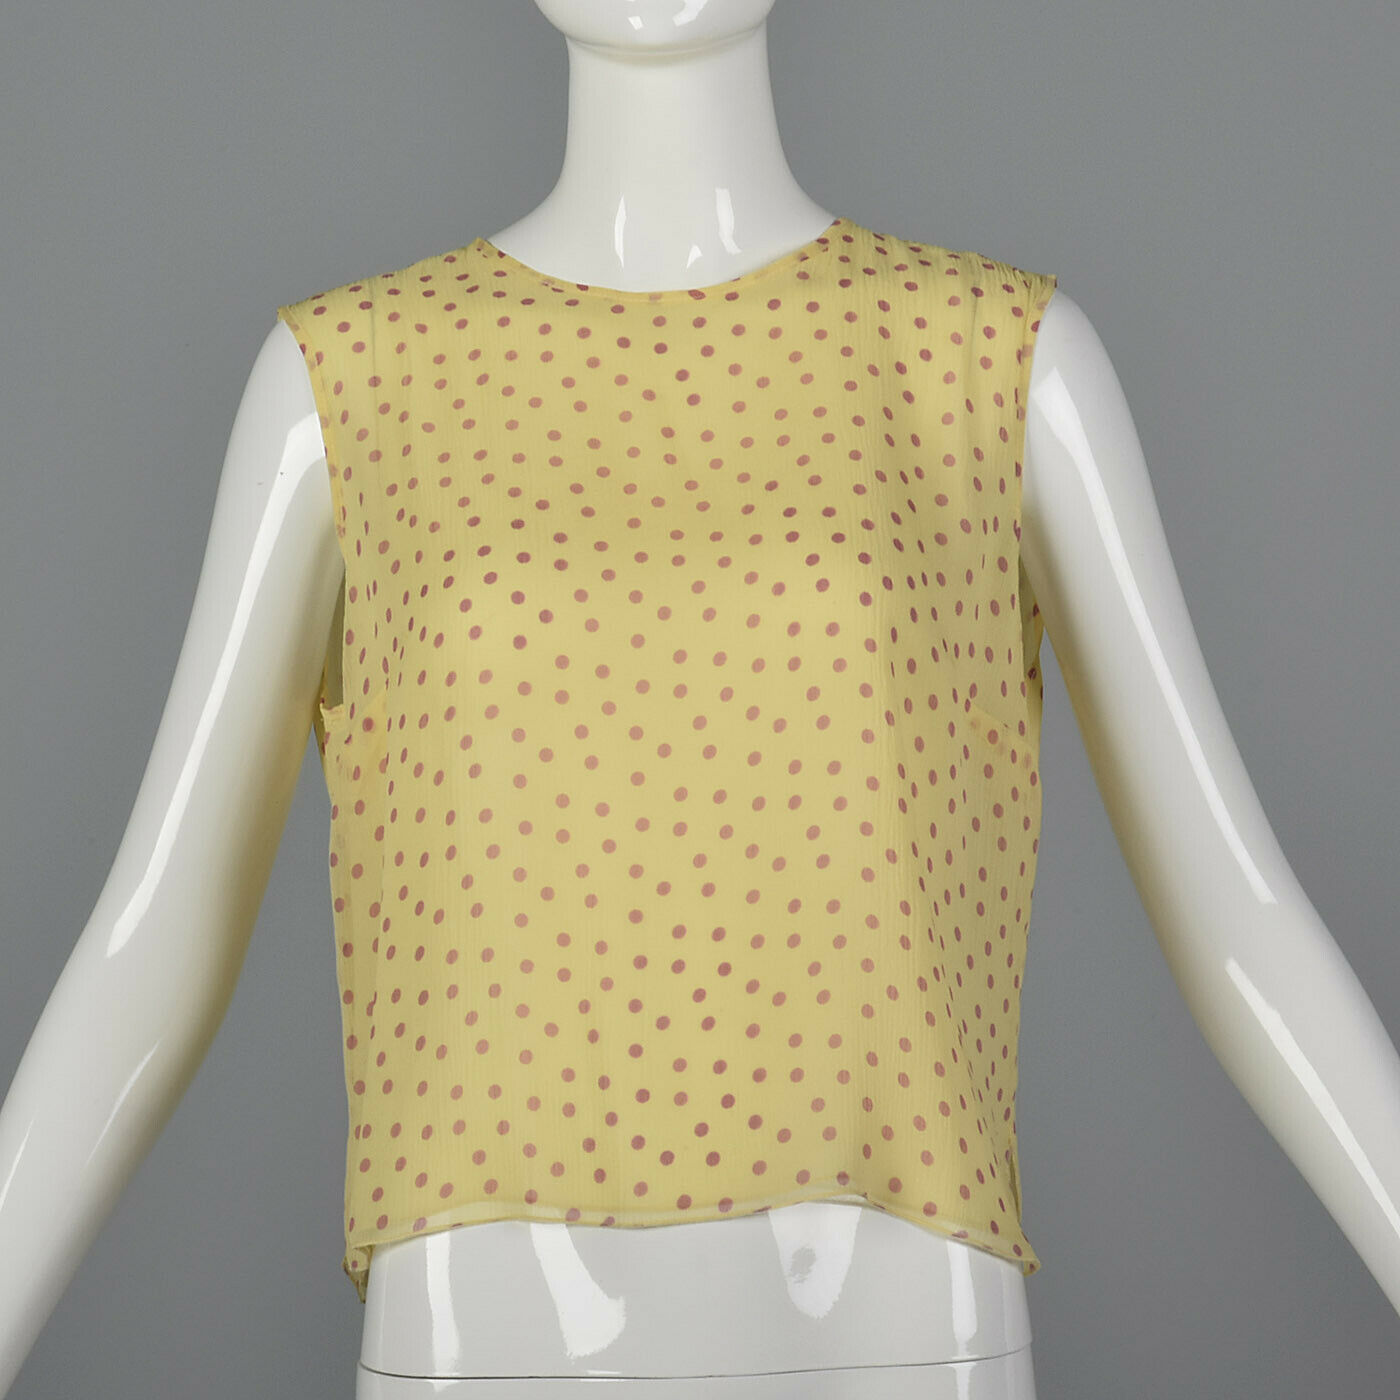 Medium Silk Blouse Gelb Rosa Polka Dots Tank Top Summer Sleeveless Shirt Light